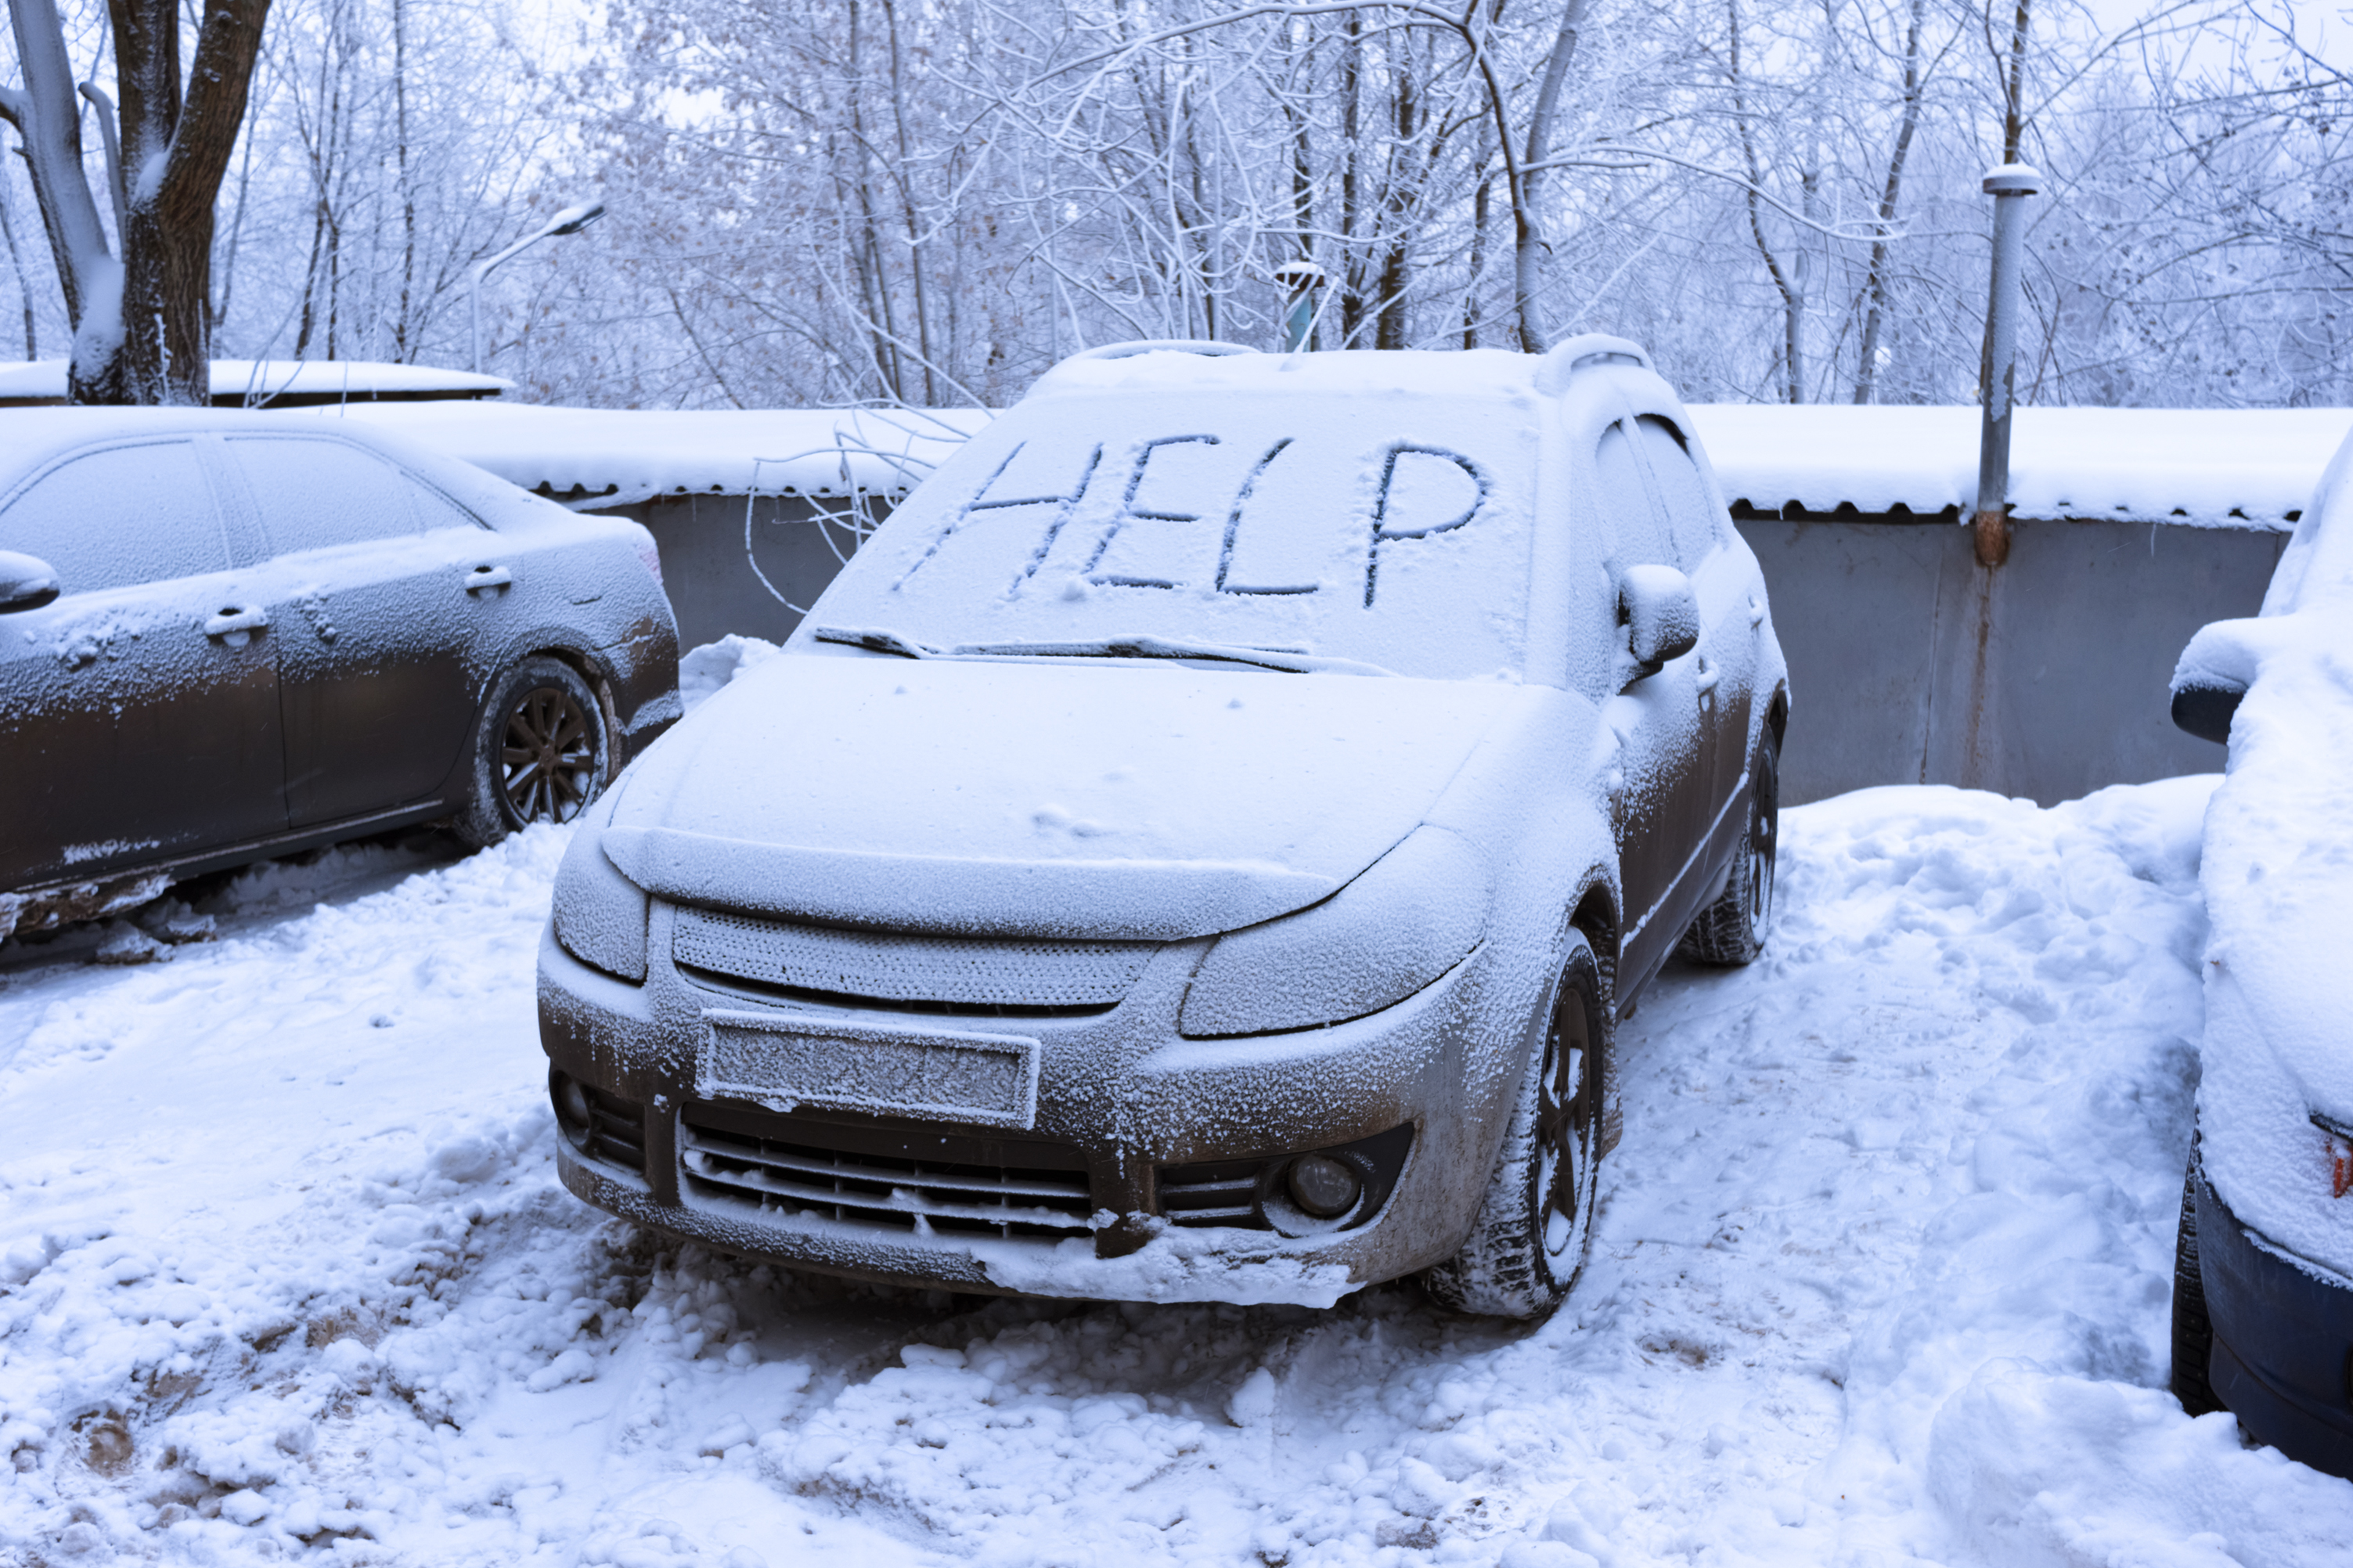 Word help on snow covered car | Kansas City Bone & Joint Clinic